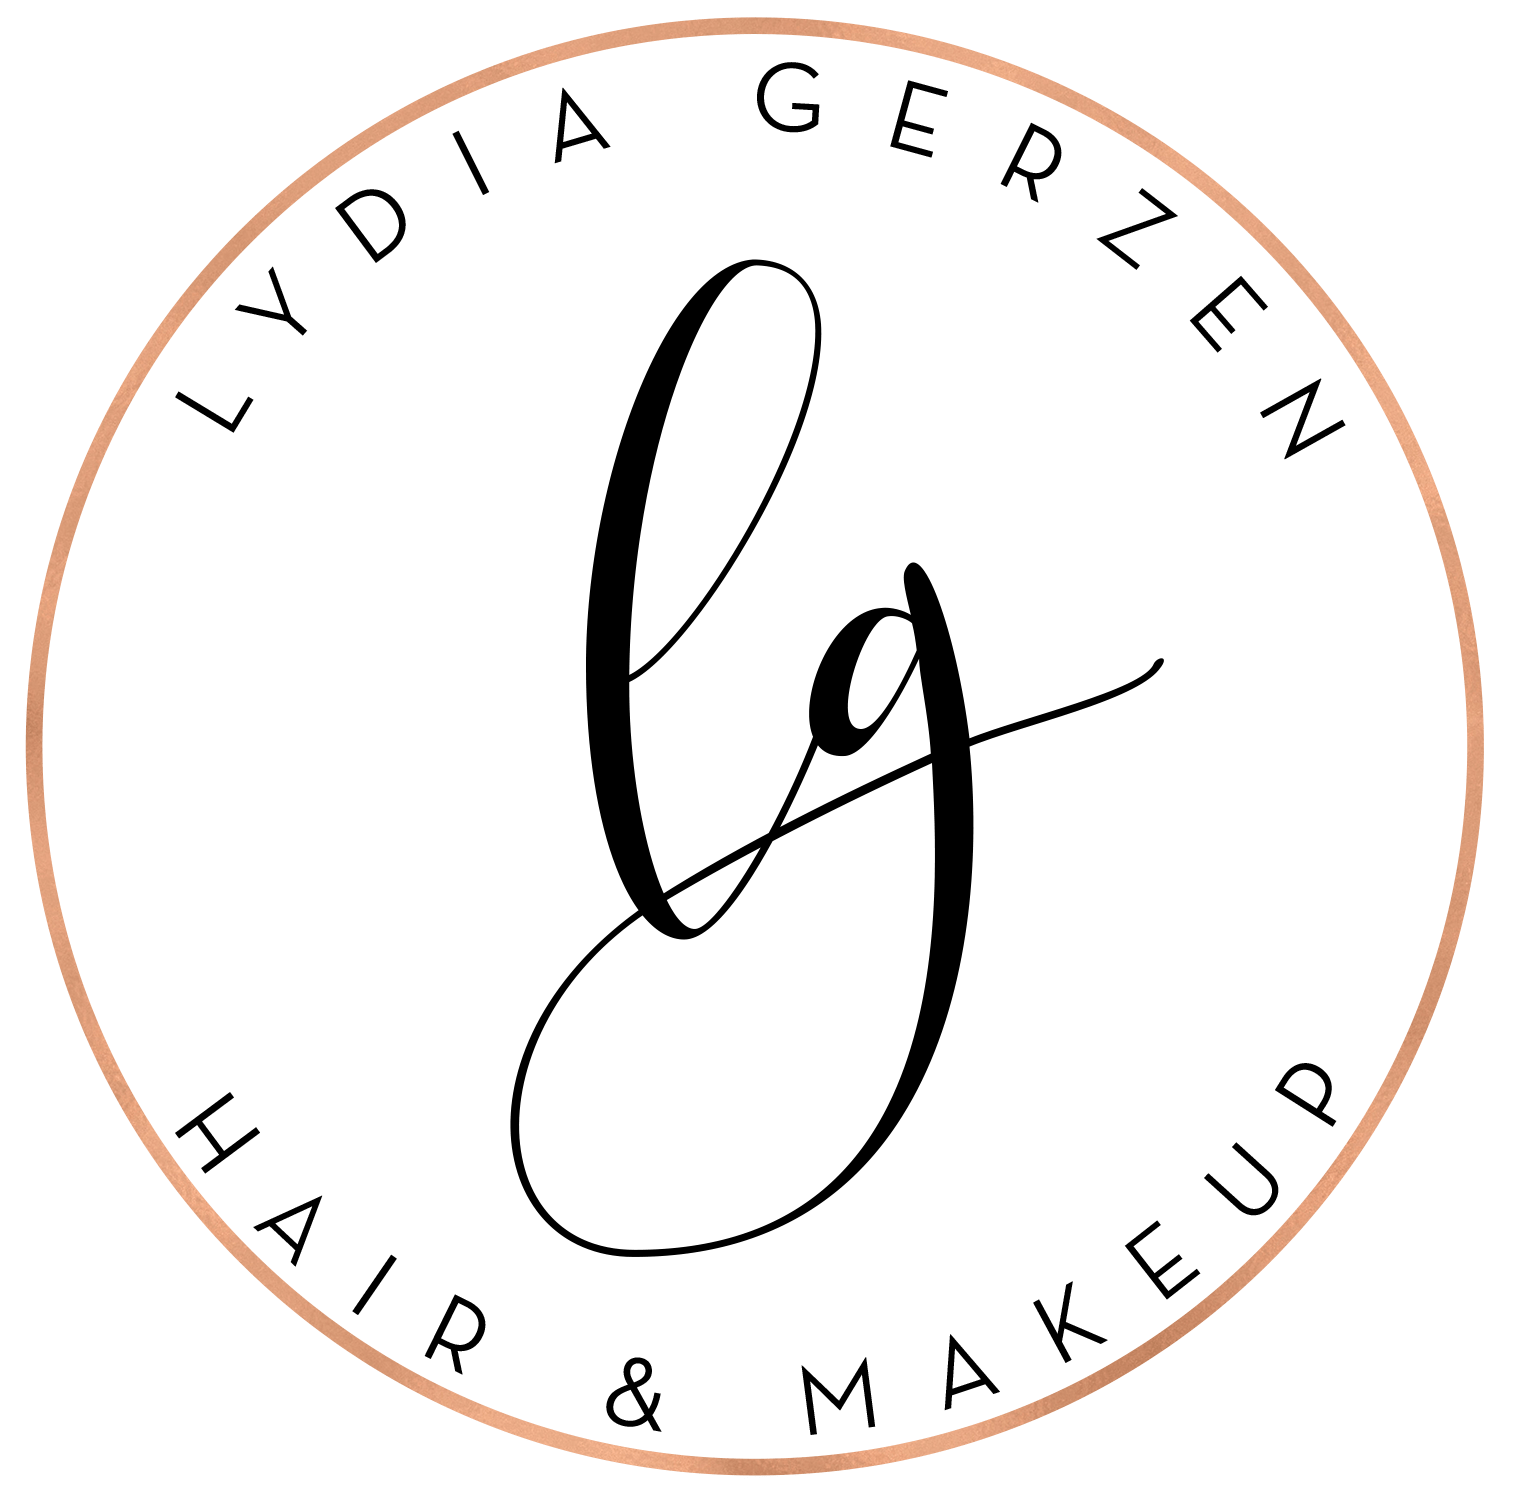 Lydia Gerzen Submark